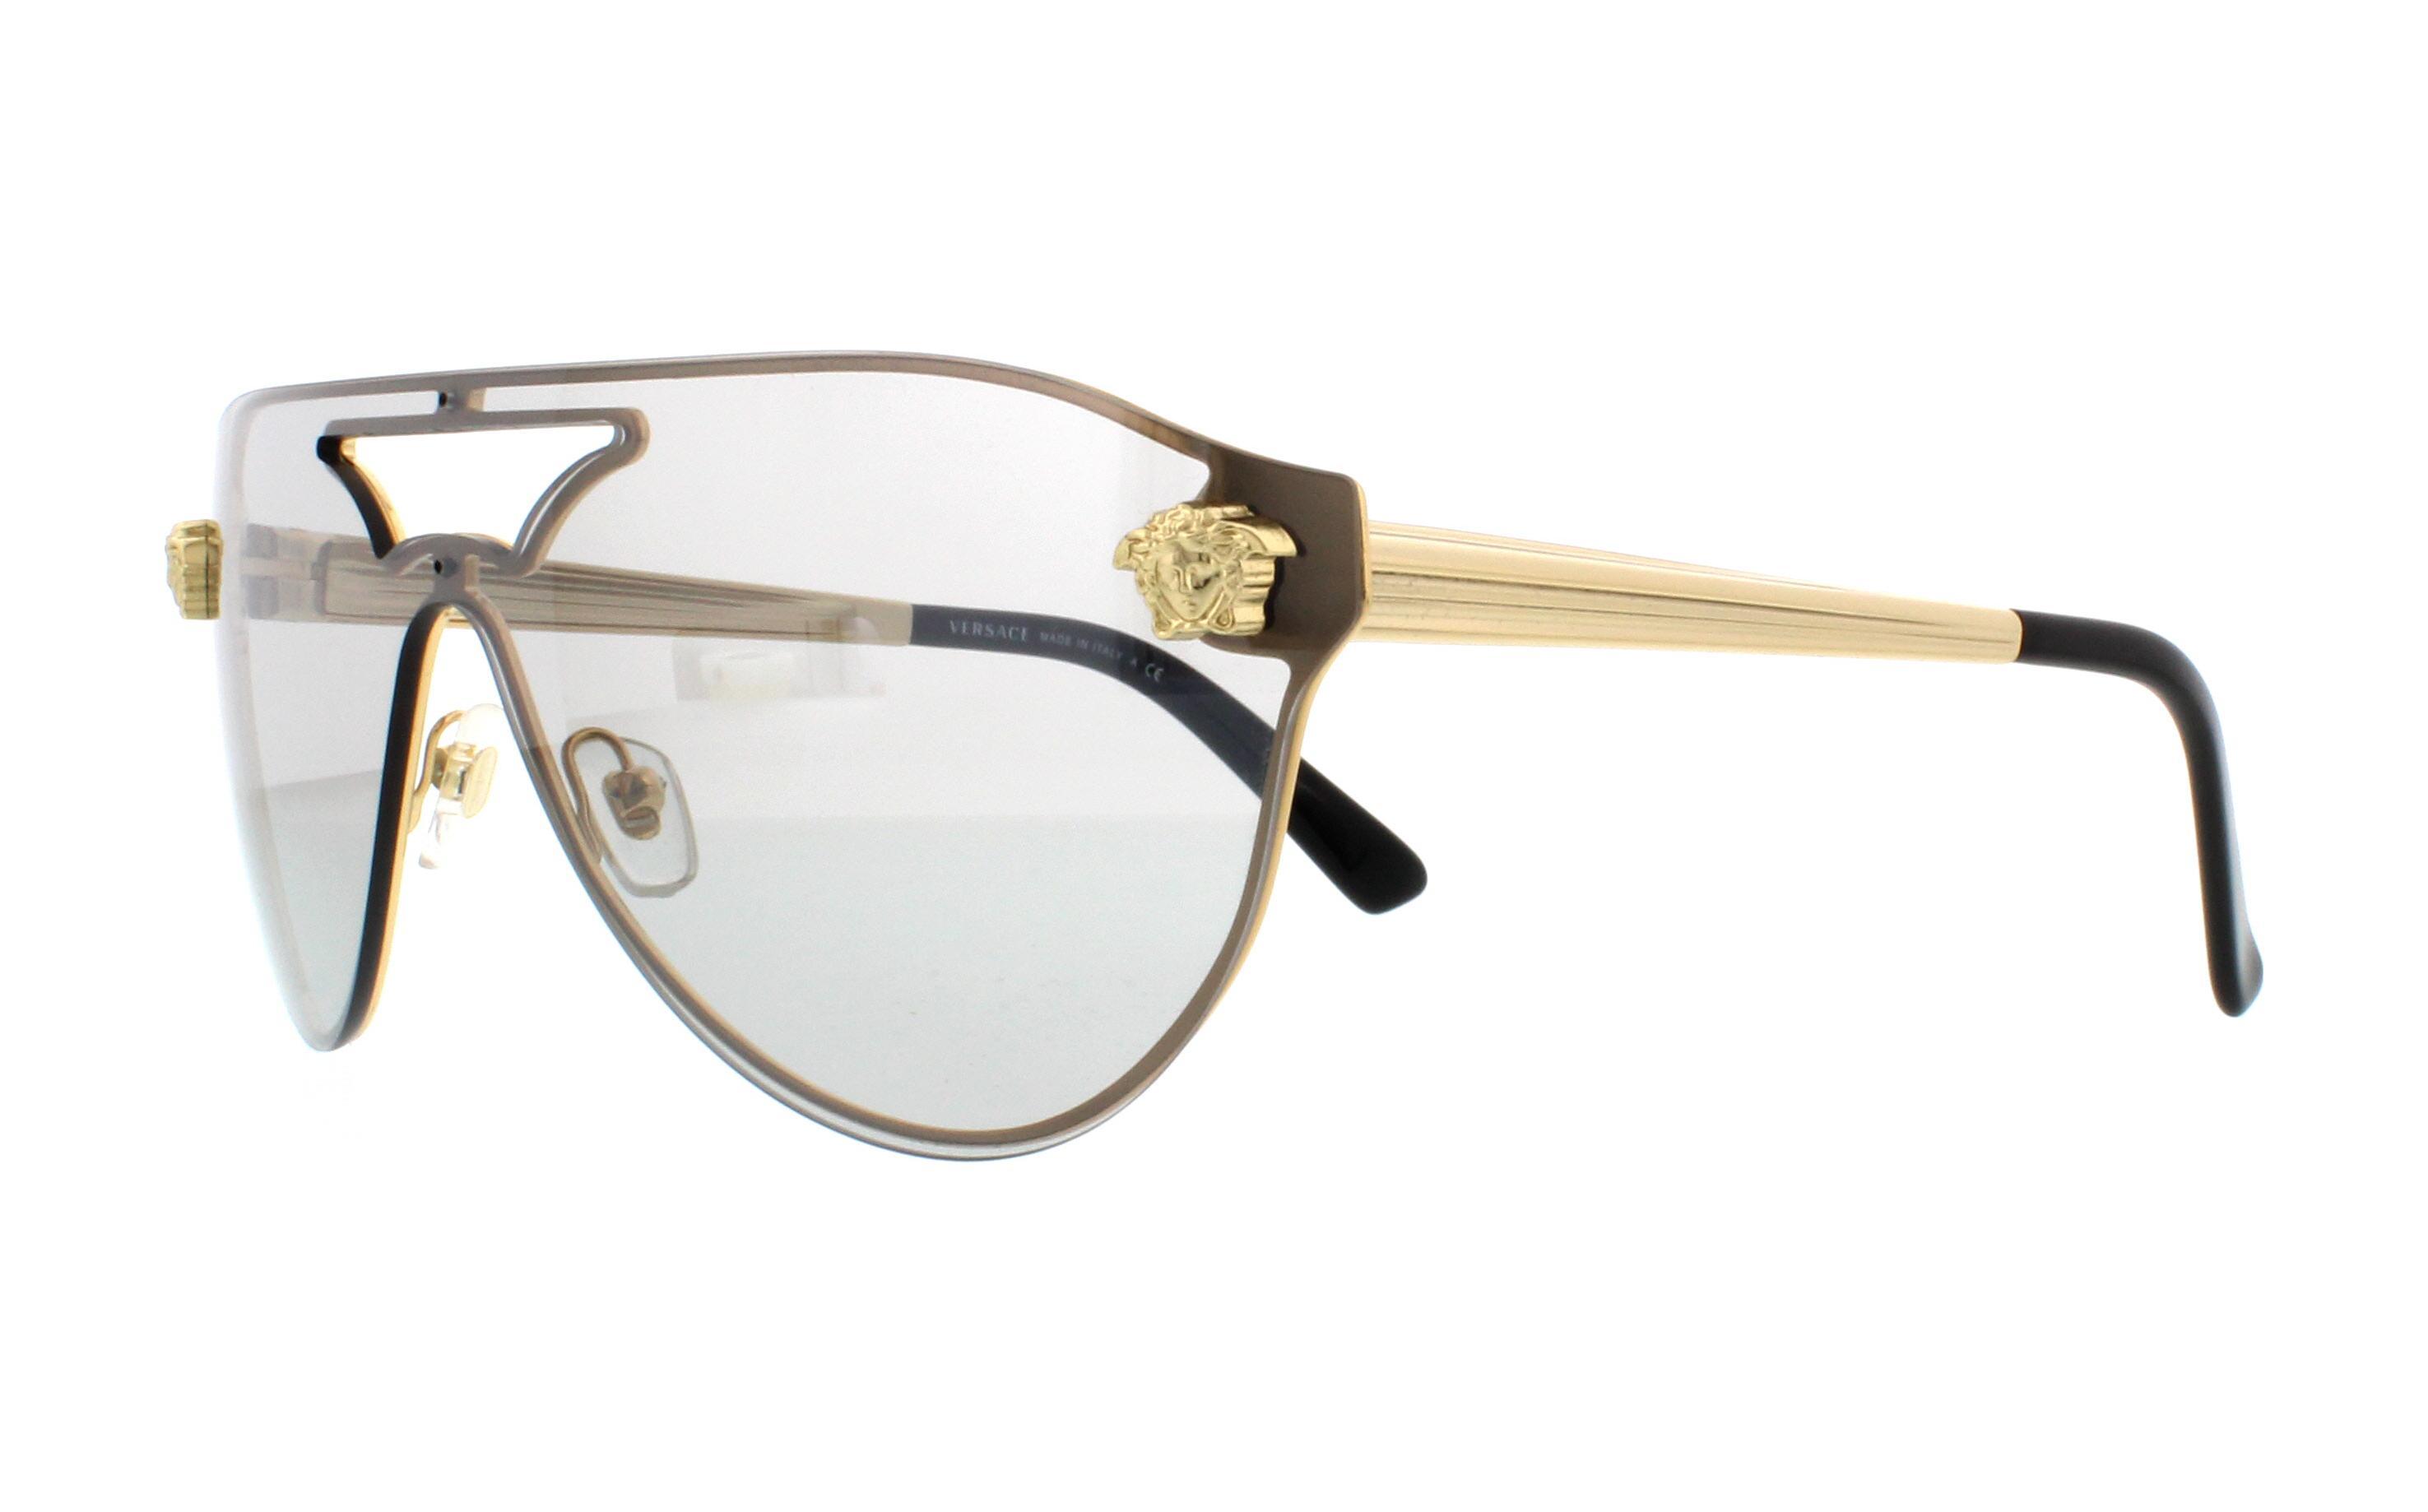 200ad70d54 NEW Versace VE2161-1002 6G-42 Gold Sunglasses 8053672415001